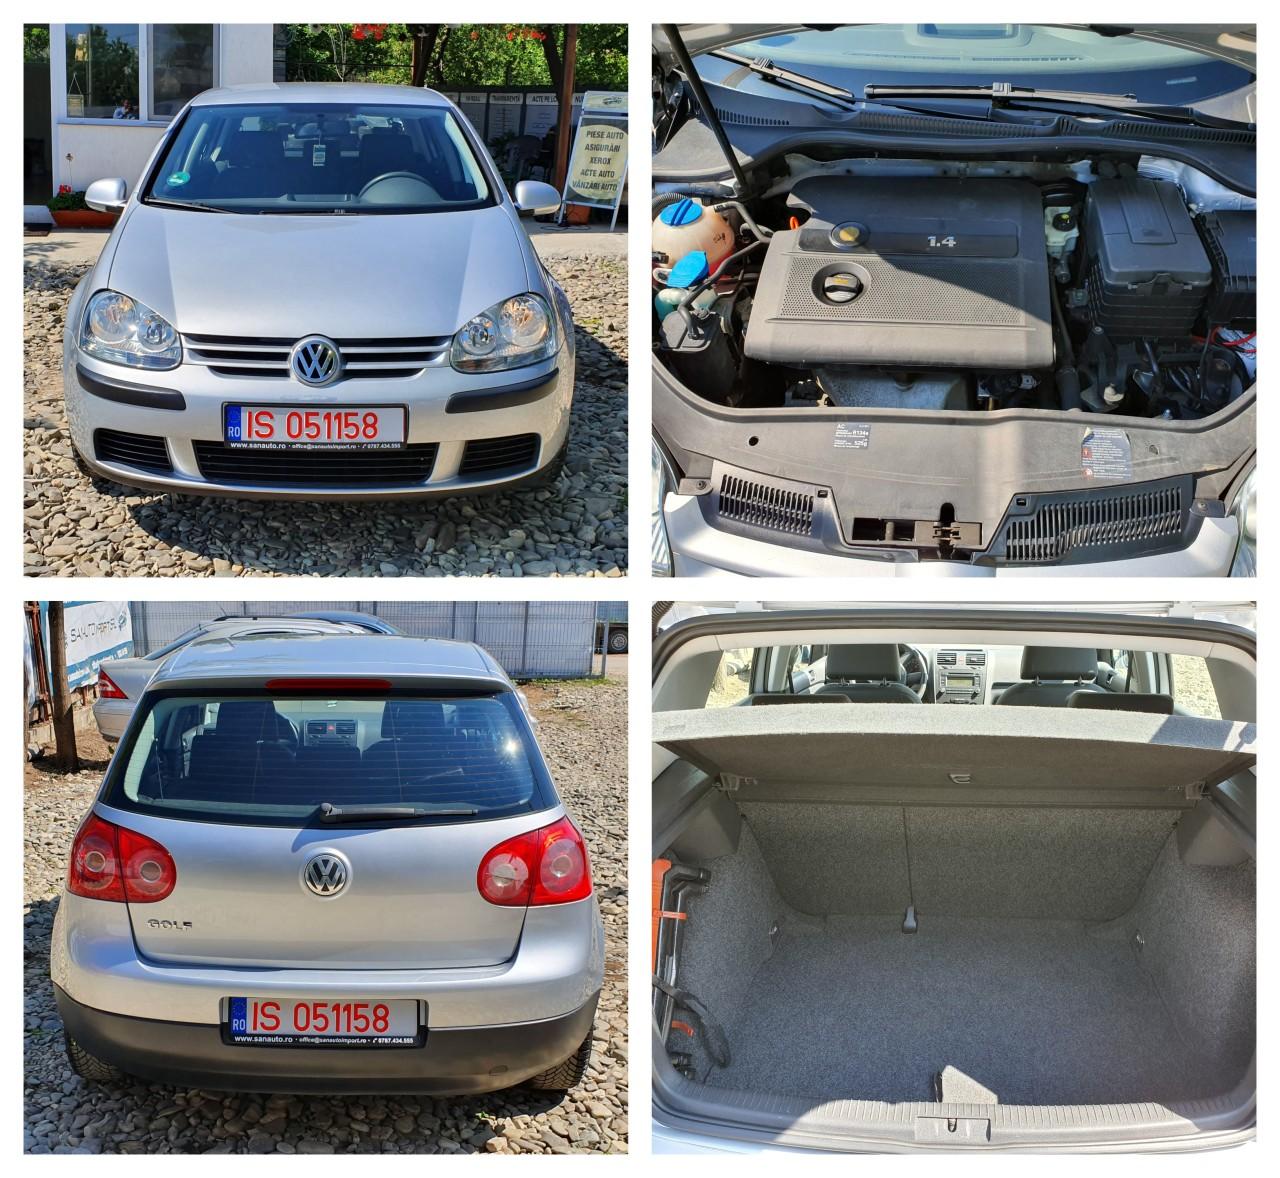 VW Golf 1.4 2004